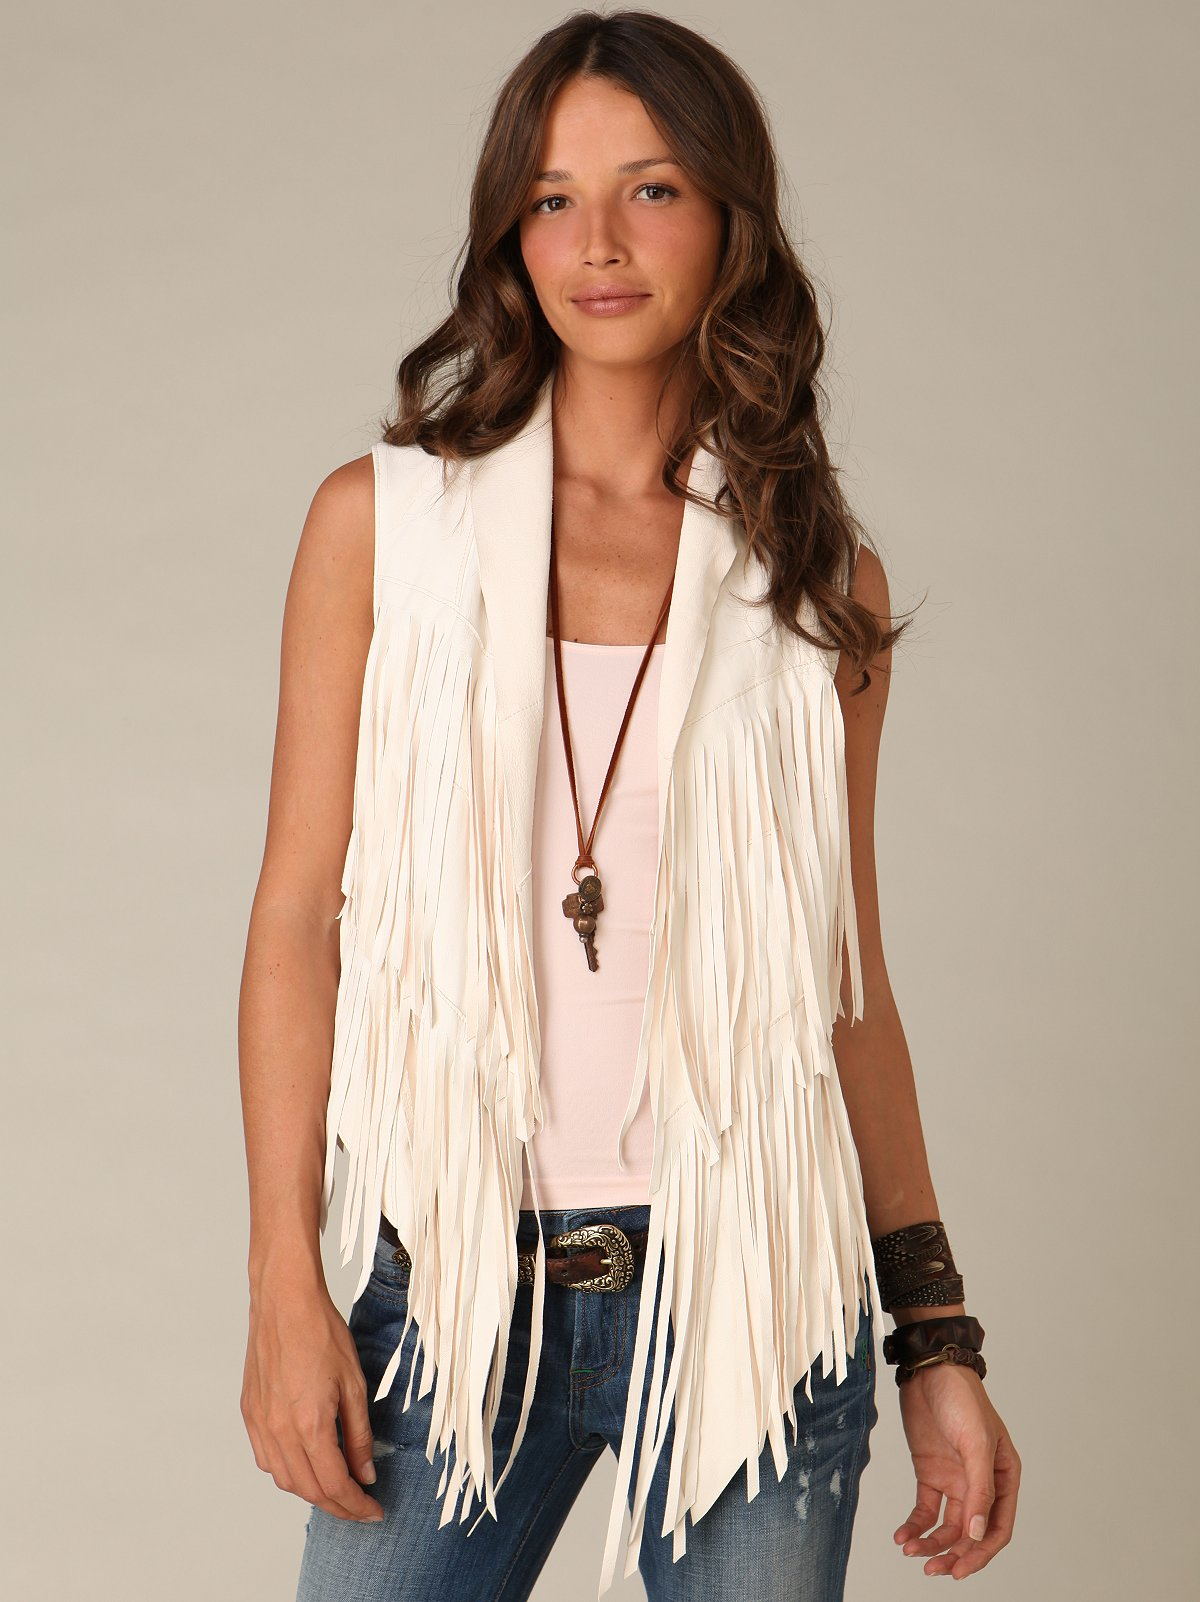 Graham & Spencer Leather Fringe Vest